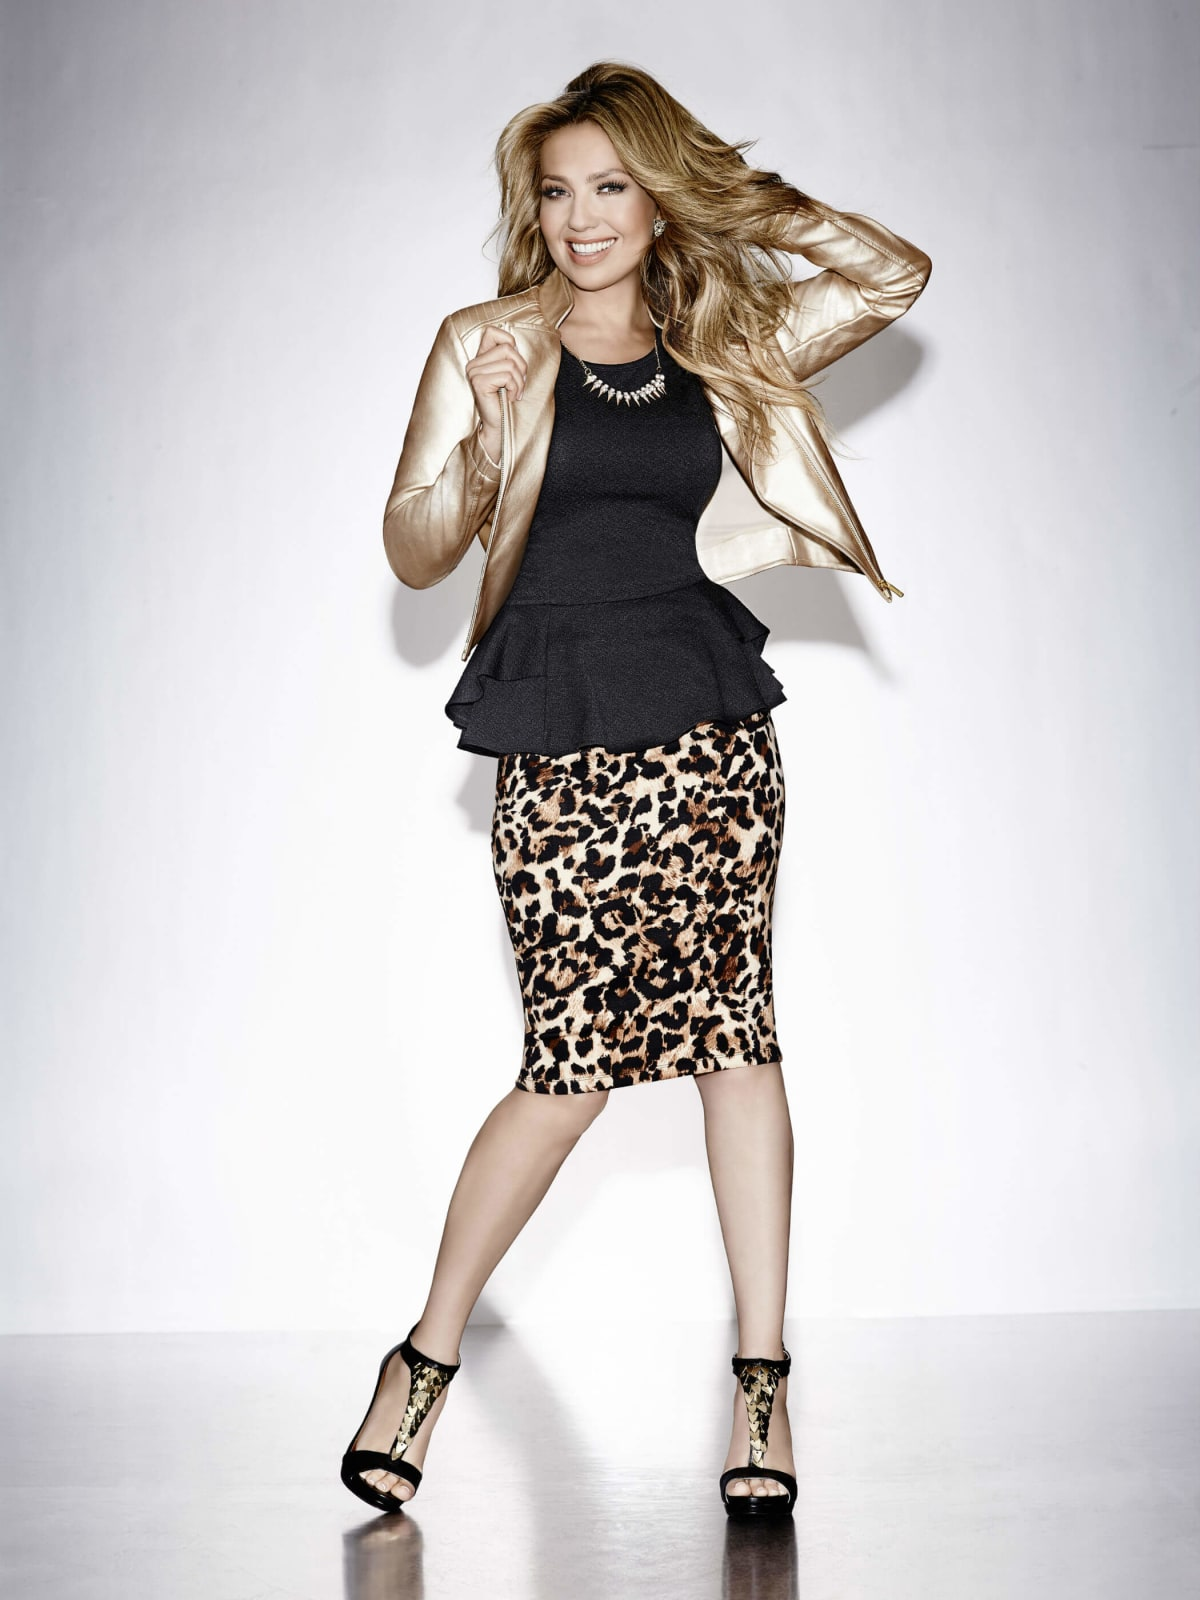 Thalia gold jacket, leopard skirt at Macy's